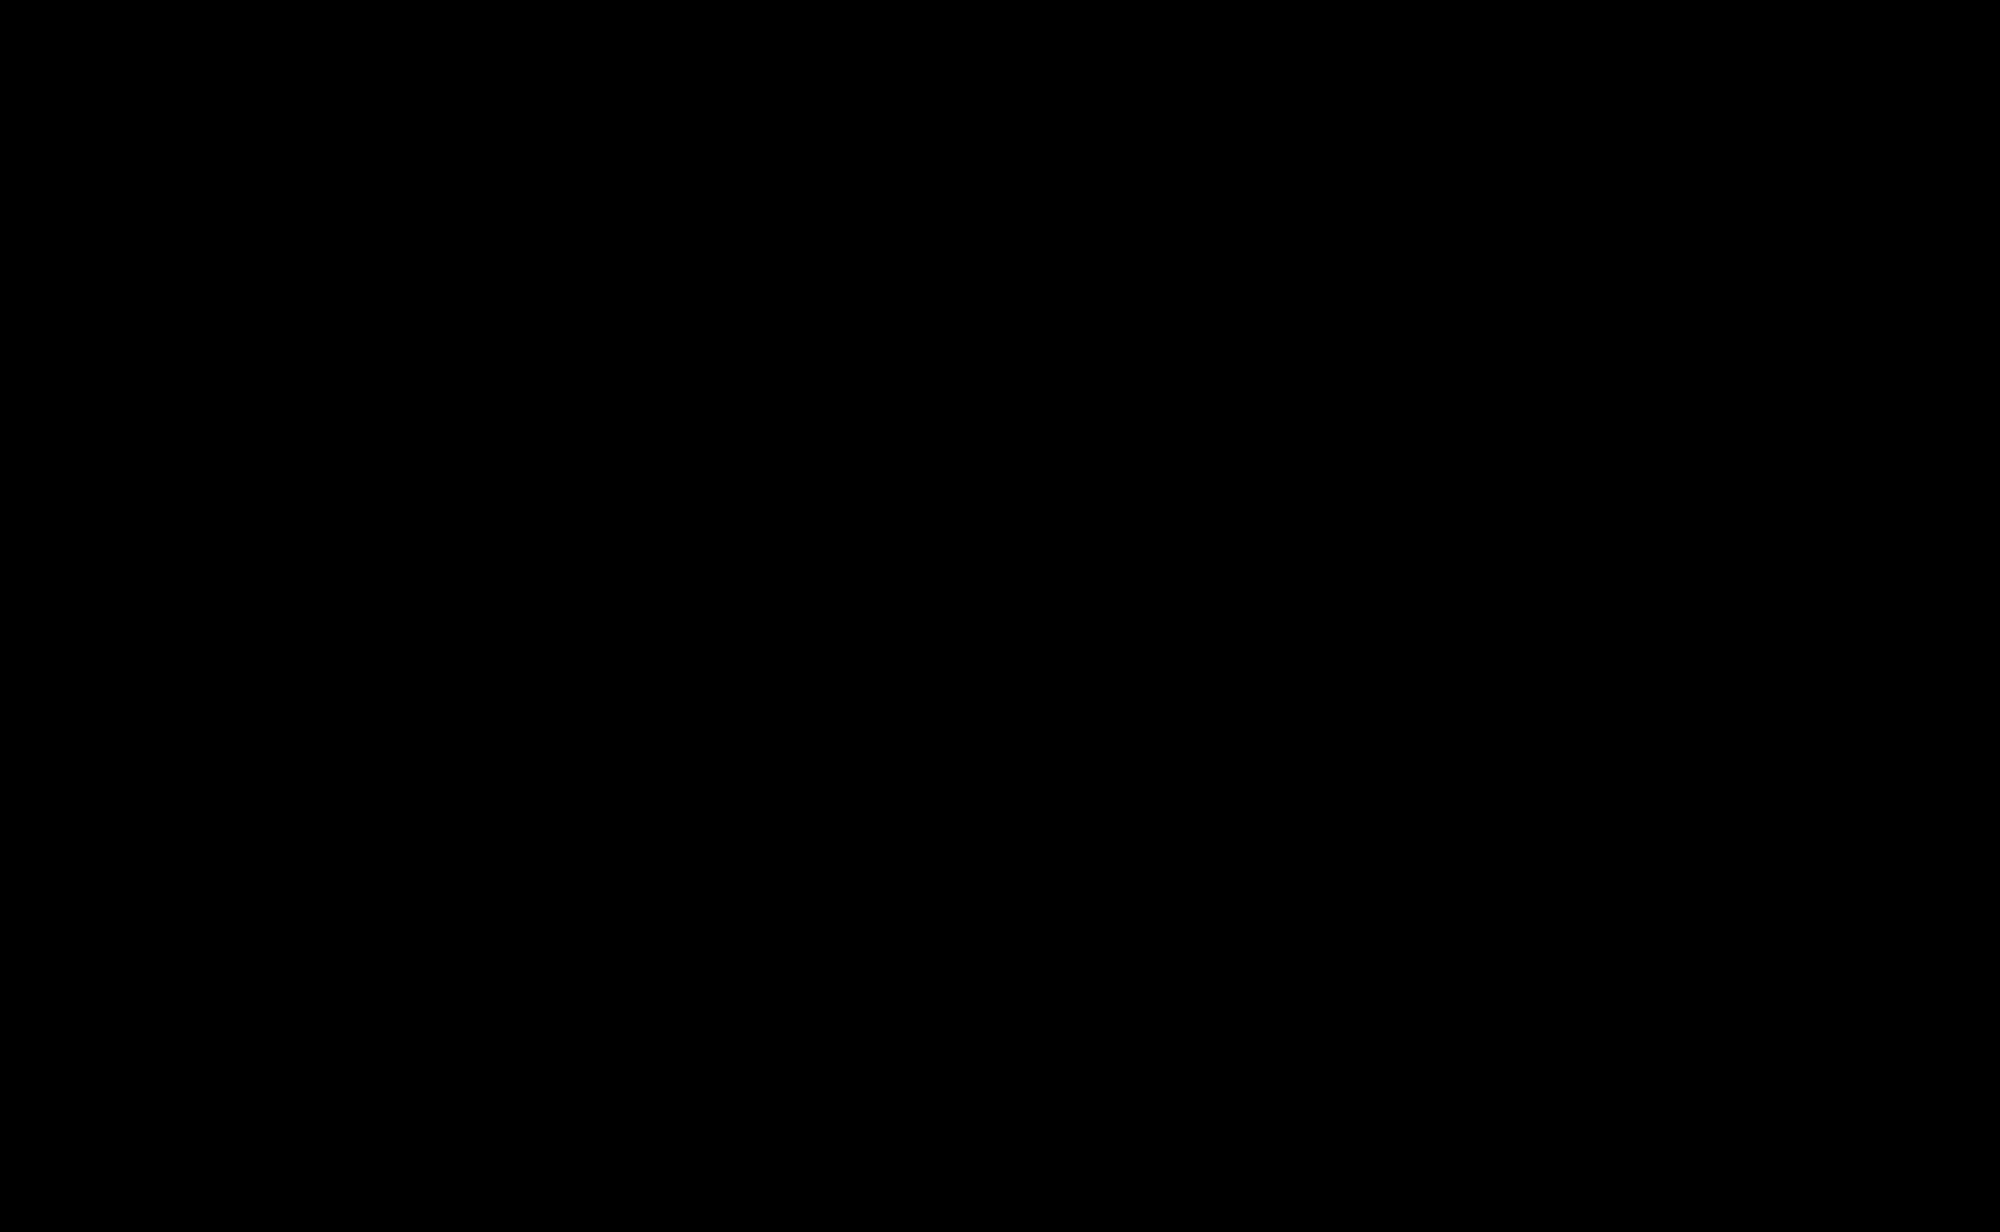 2000px Ishikawa Fishbone Diagram Svg Png 2000 1232 Ishikawa Diagramm Ursache